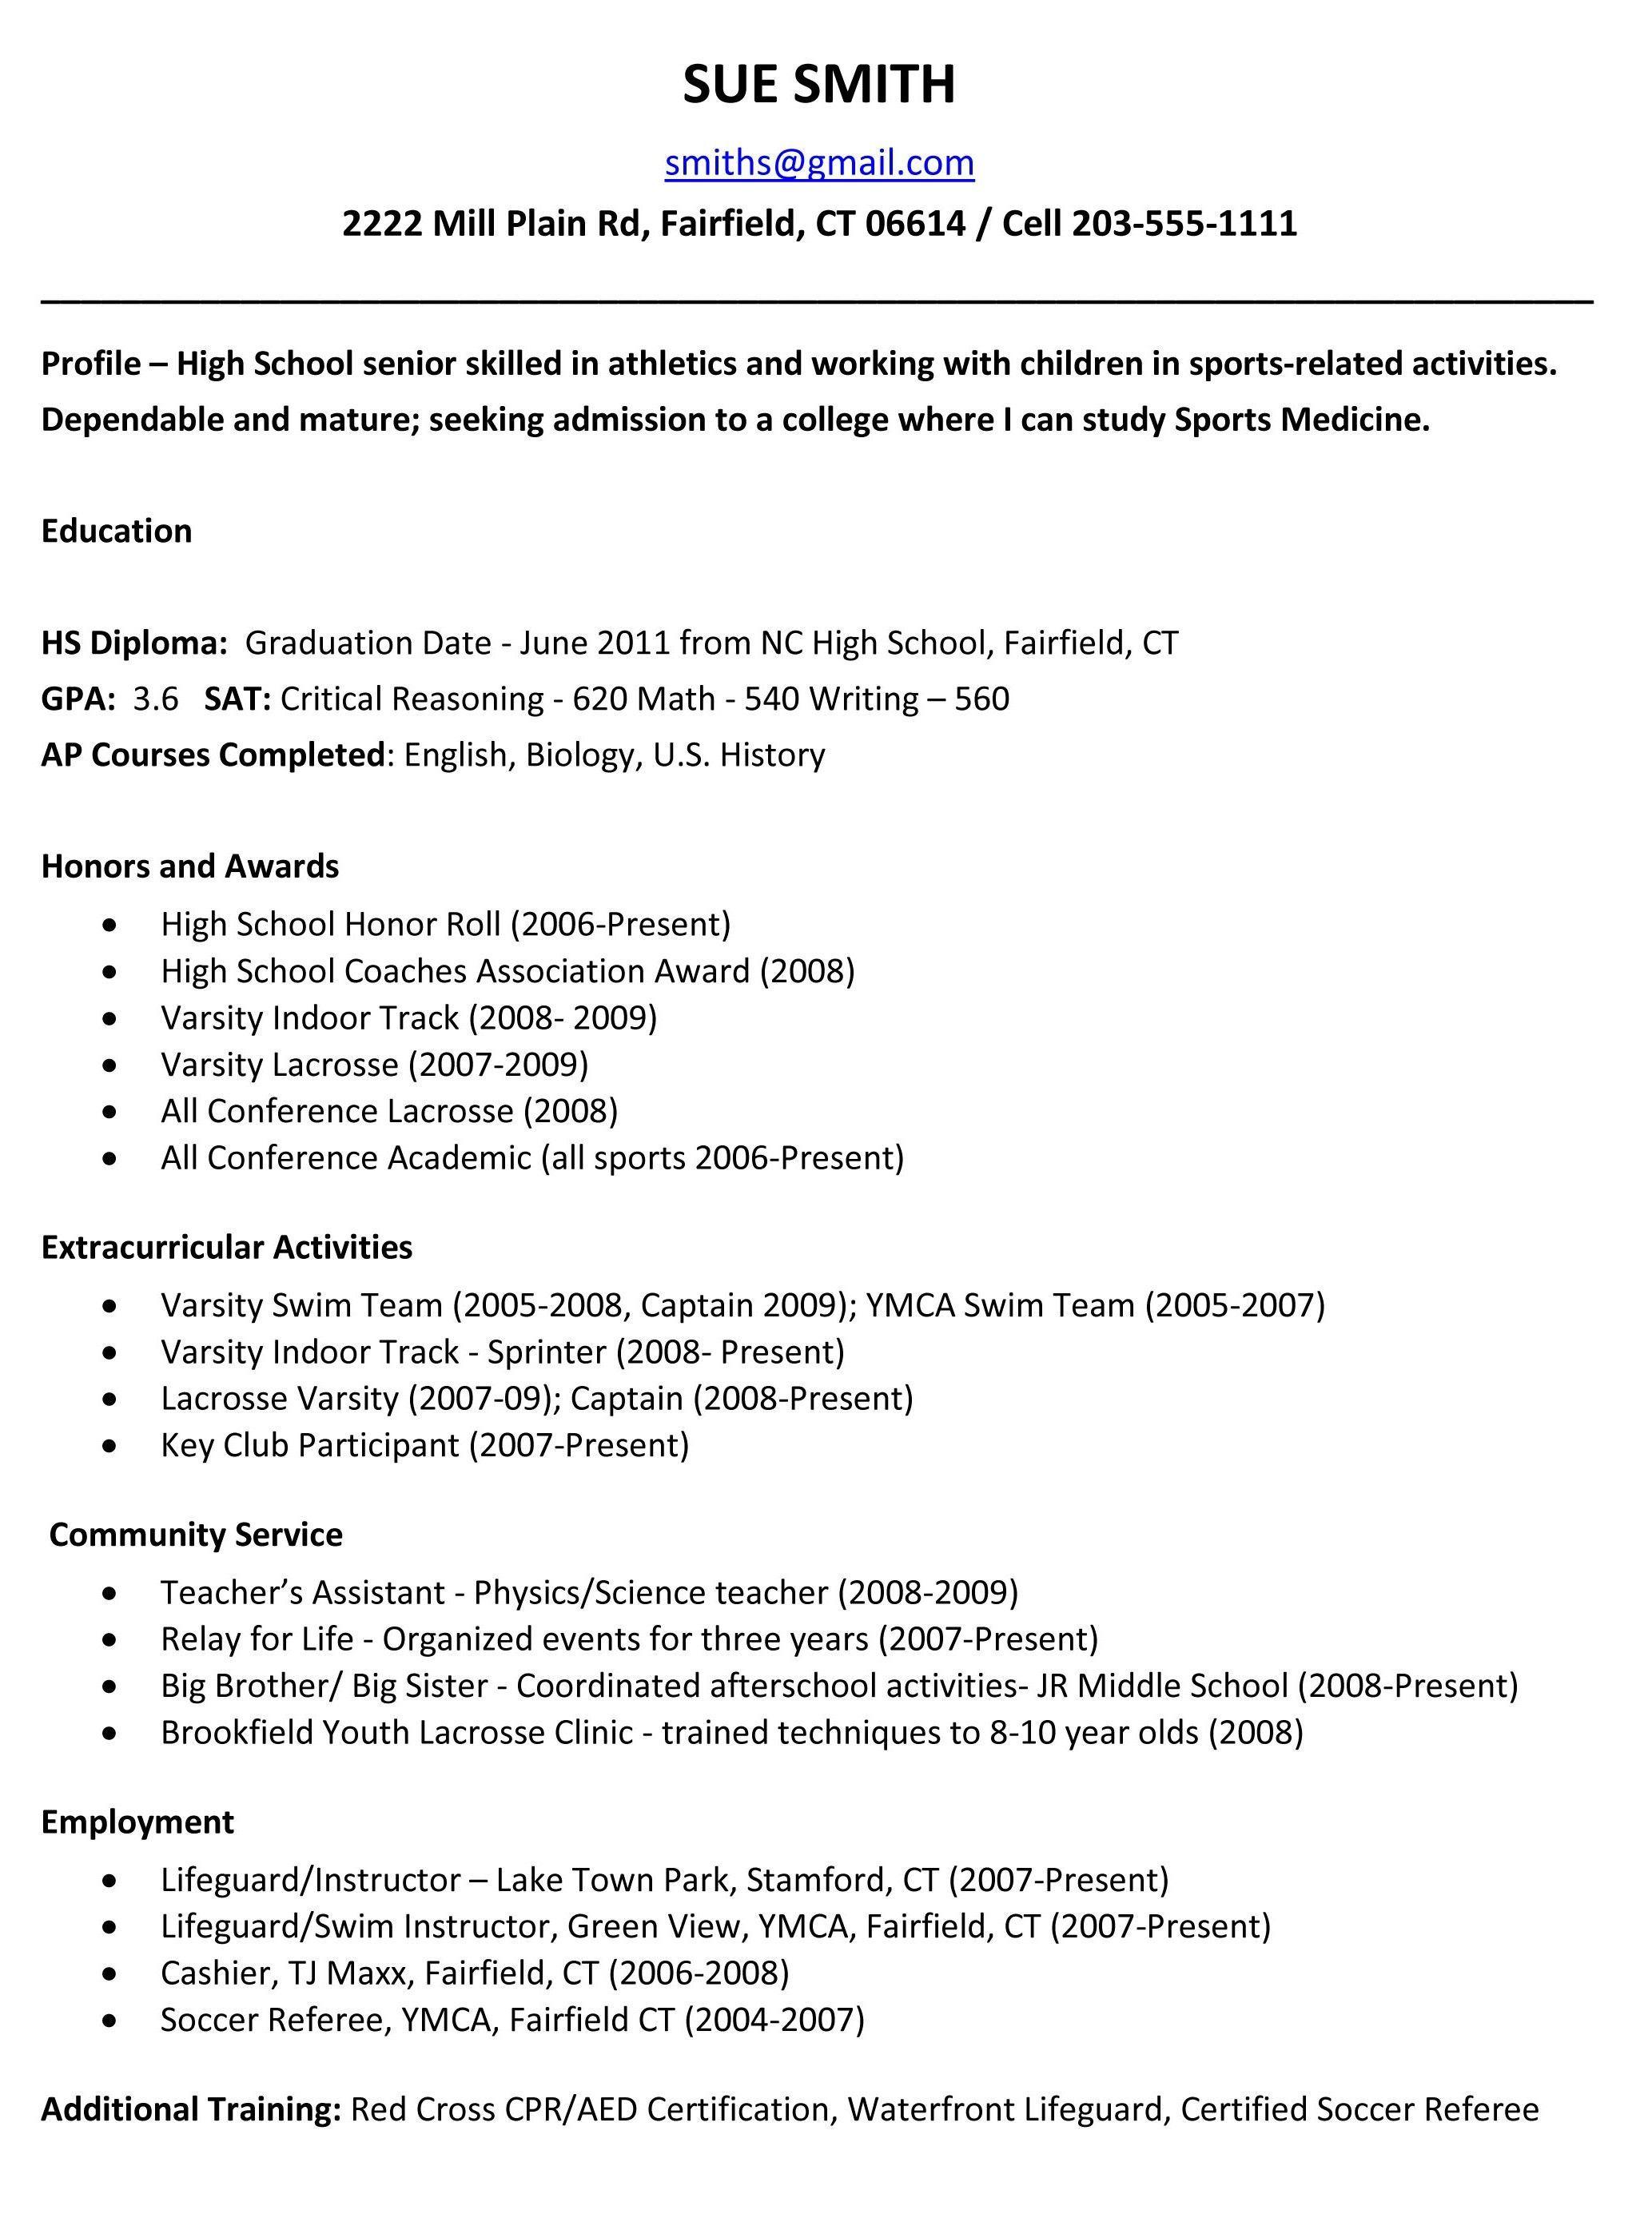 004 Astounding High School Student Resume Template Idea  Free Microsoft Word 2010Full